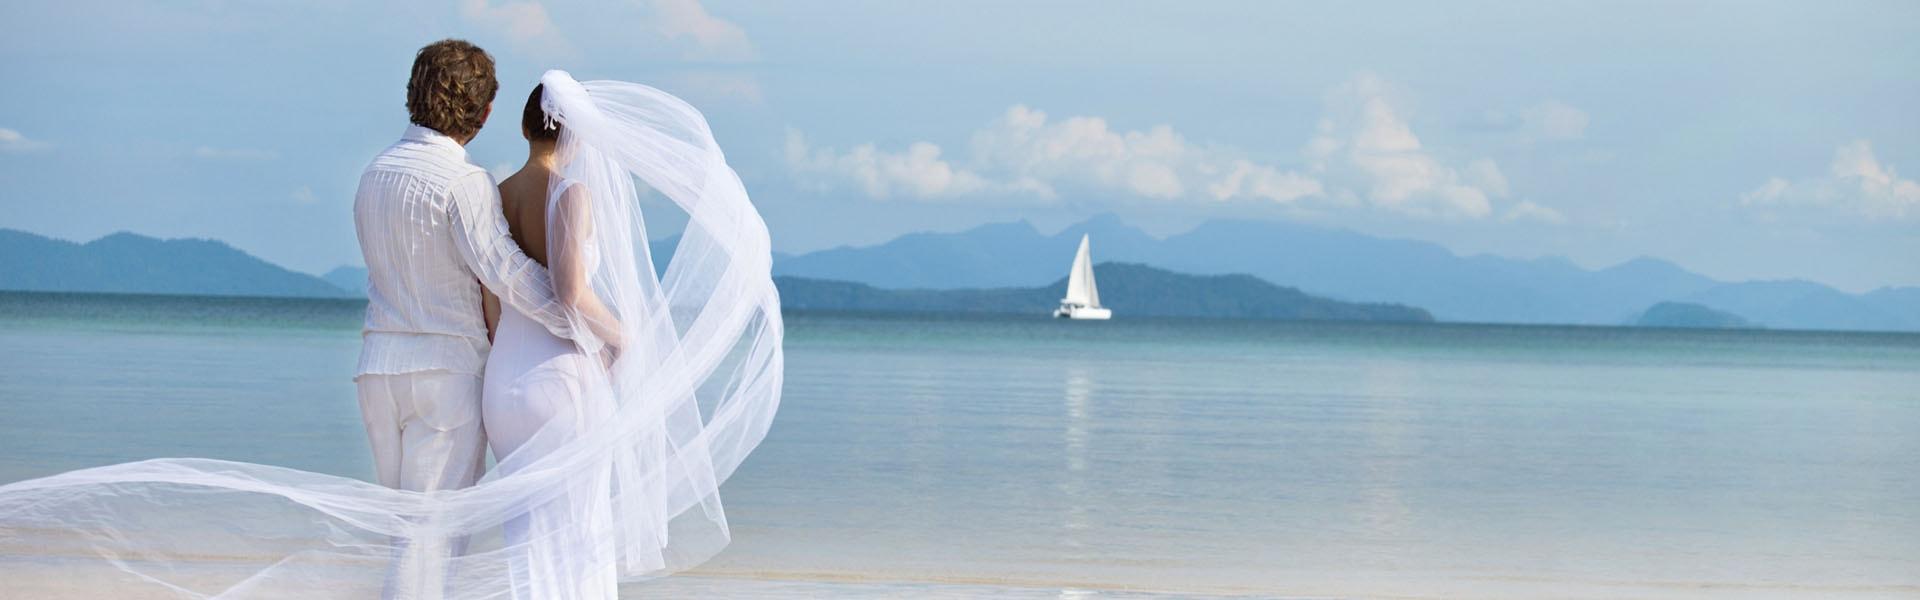 свадебное путешествие proj-zv (7)